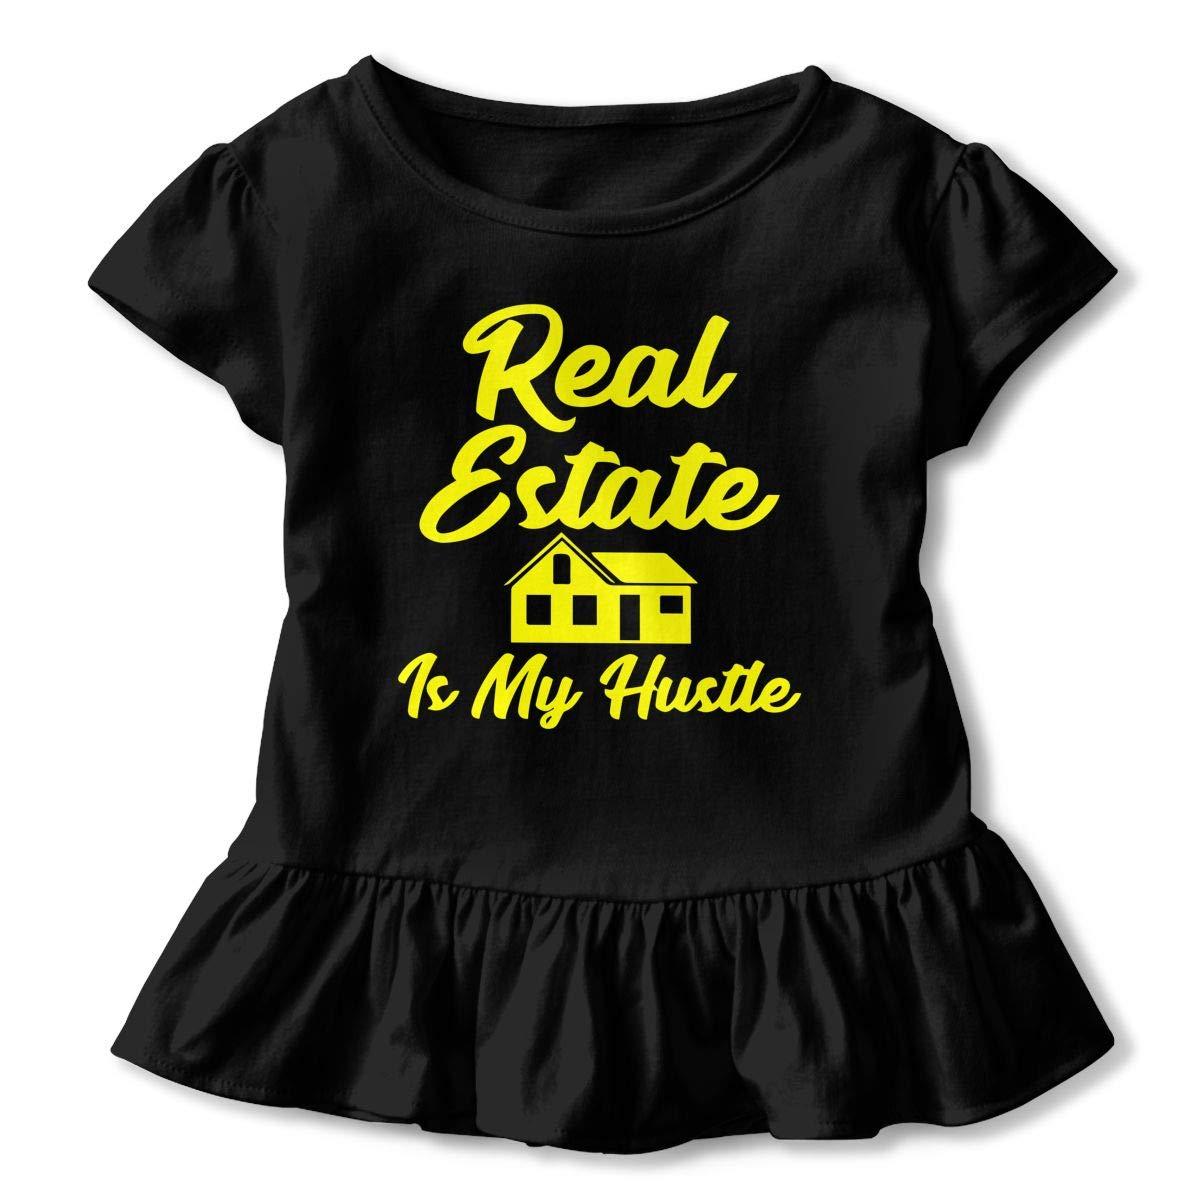 Real Estate is My Hustle Toddler Girls T Shirt Kids Cotton Short Sleeve Ruffle Tee